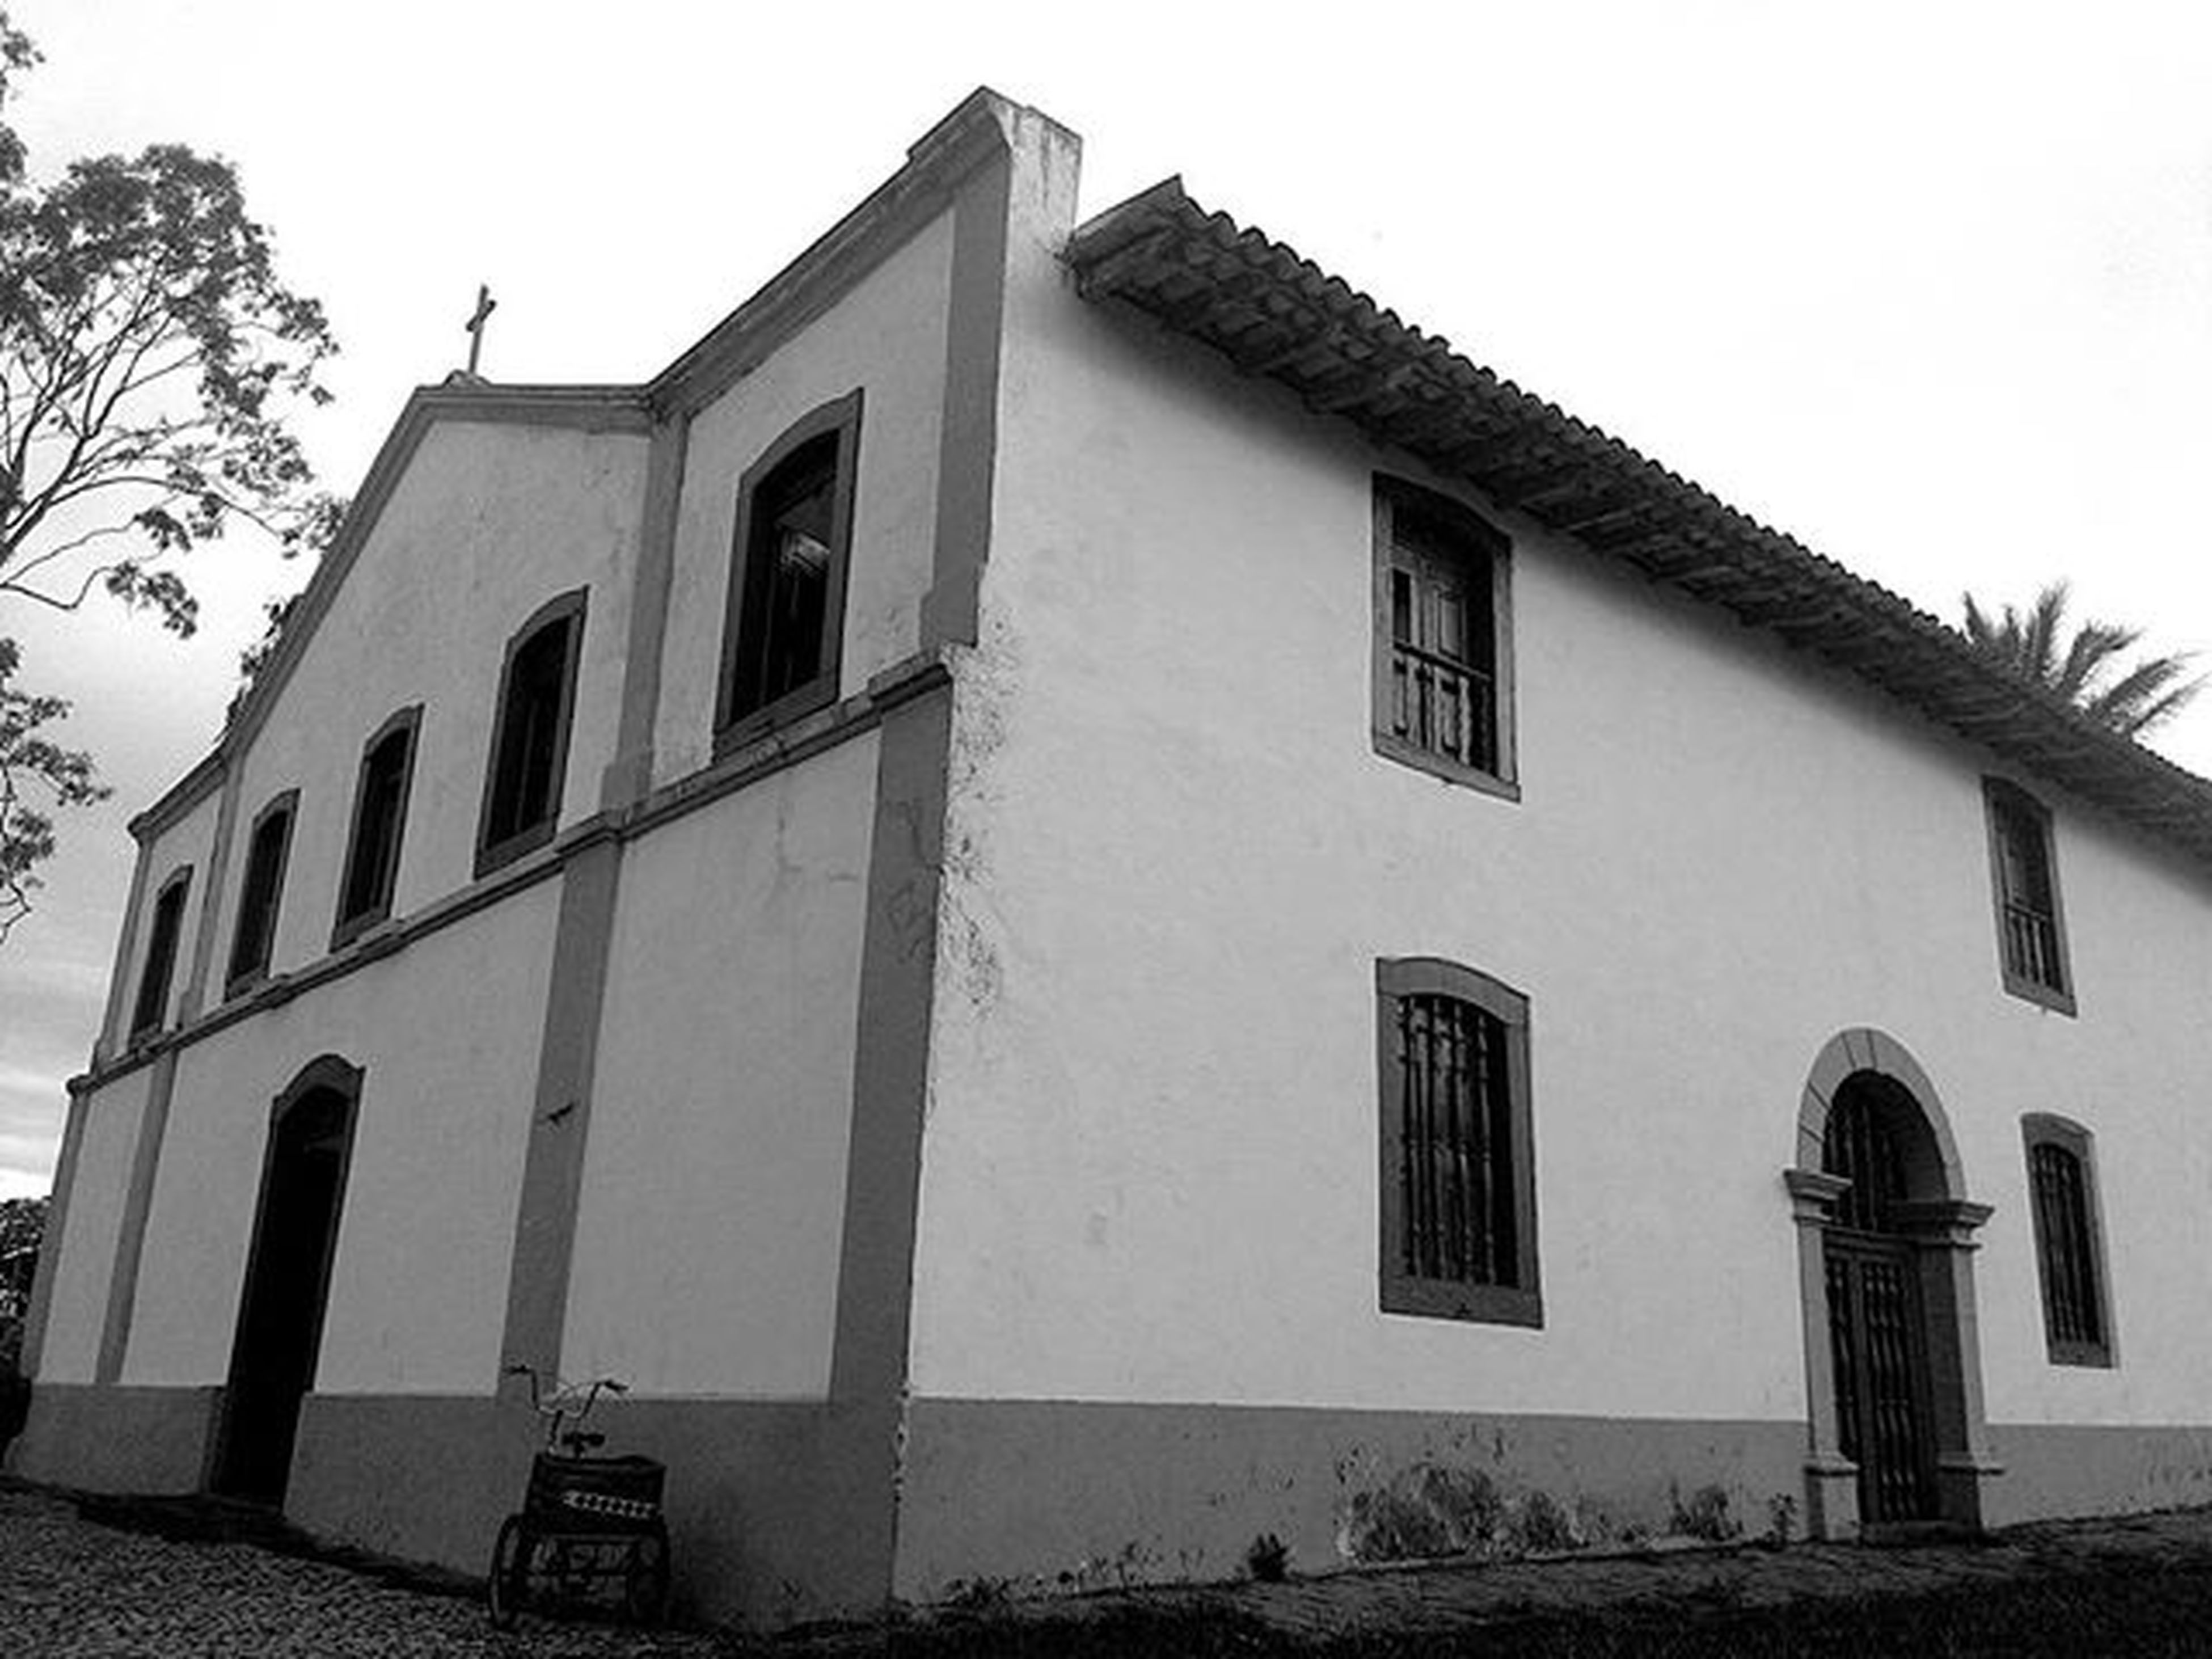 Igreja Nossa Senhora de Santana Nossasenhorasantana Chapadadosguimaraes Asuszenfone5 Blackandwhite Faith Brazil Brasil Matogrosso MatoGrosso_Brasil